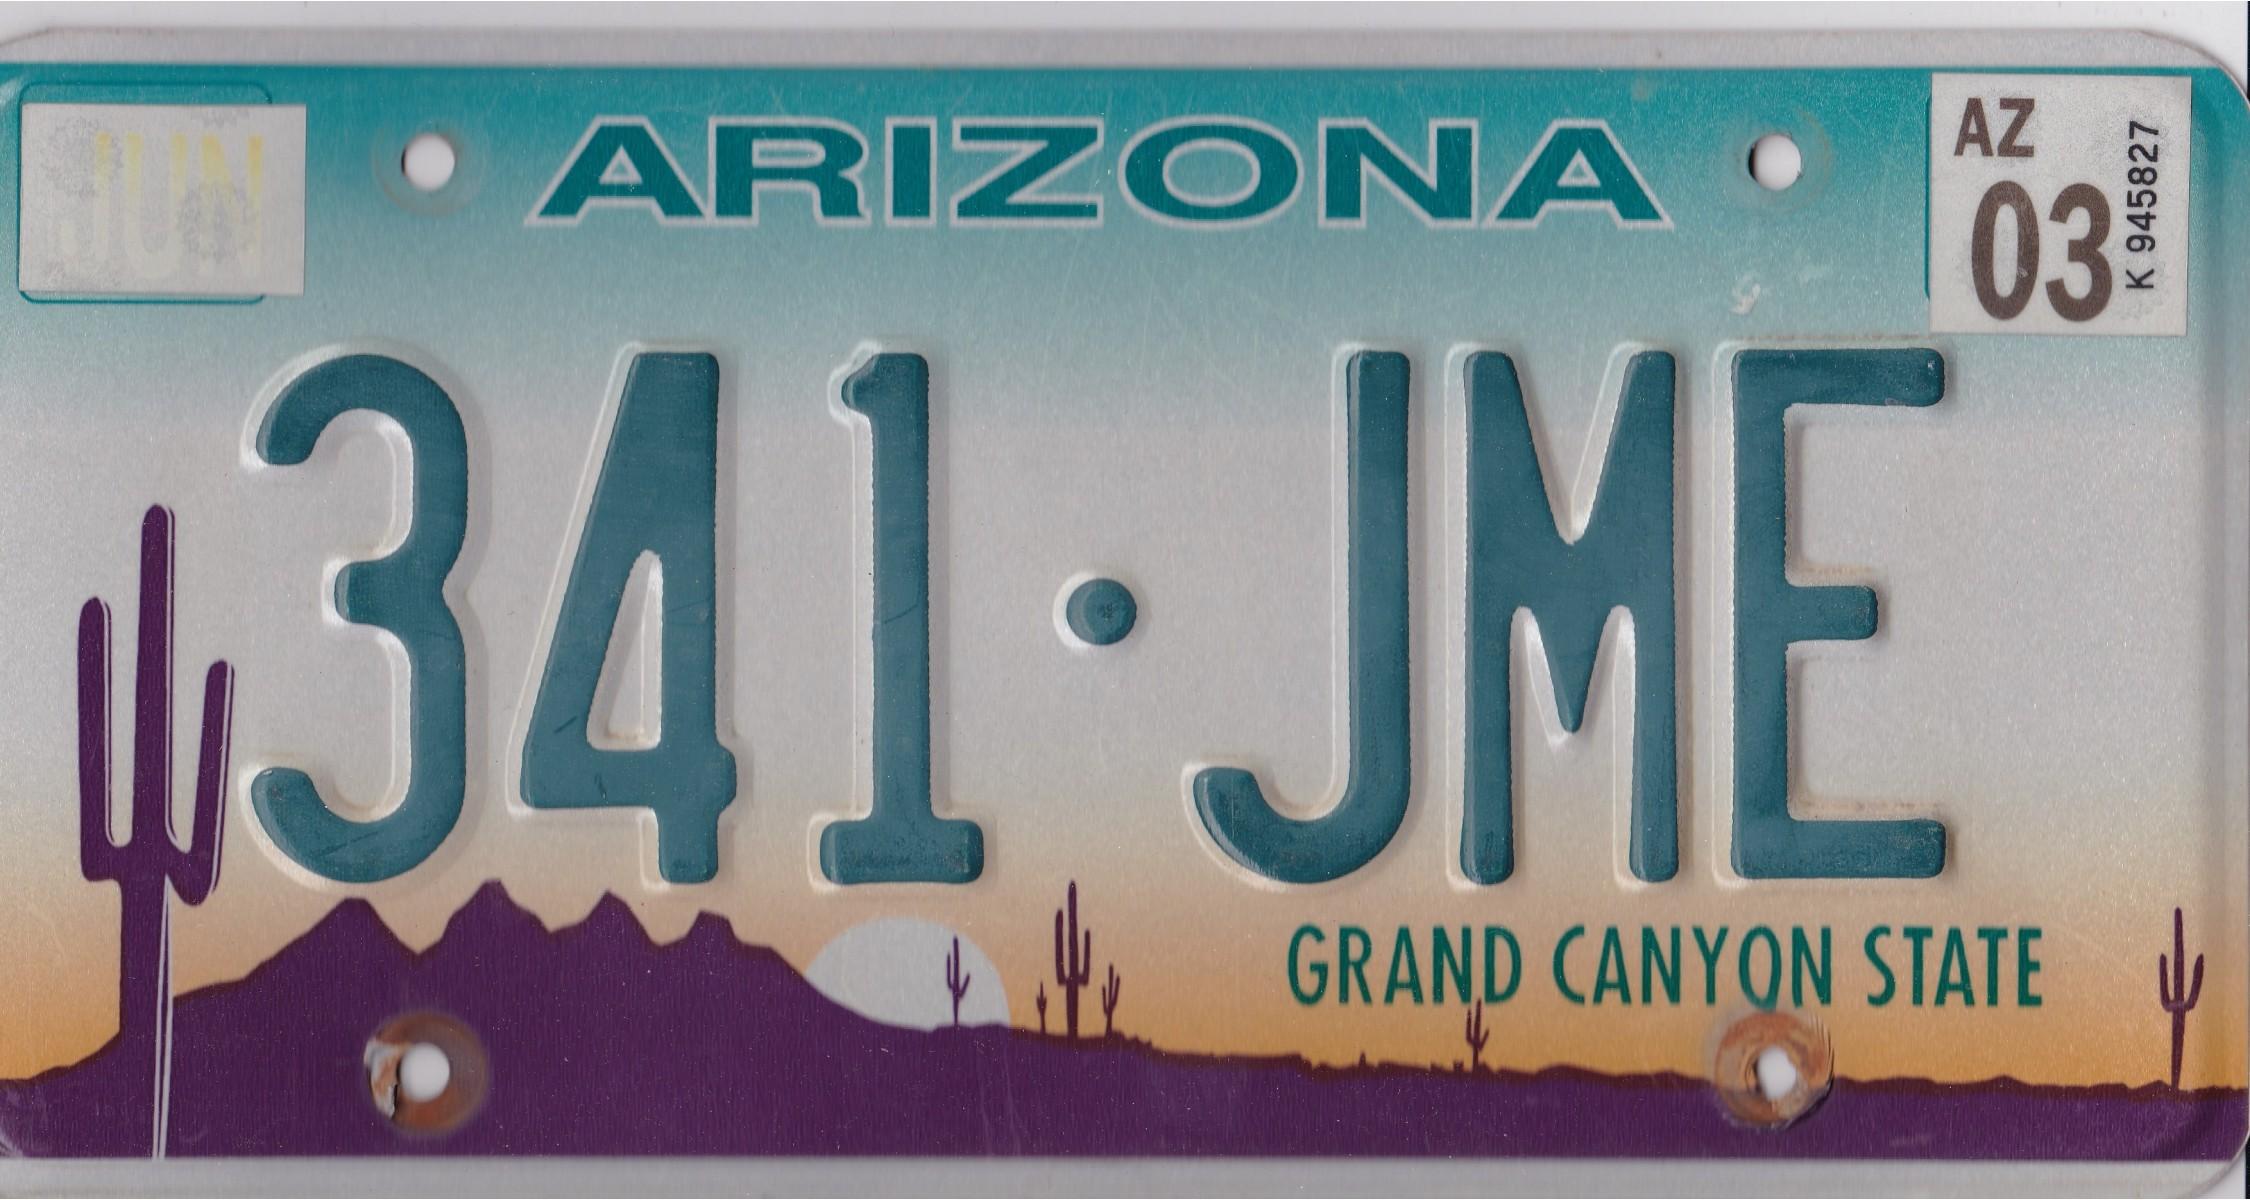 Arizona 2003 License Plate